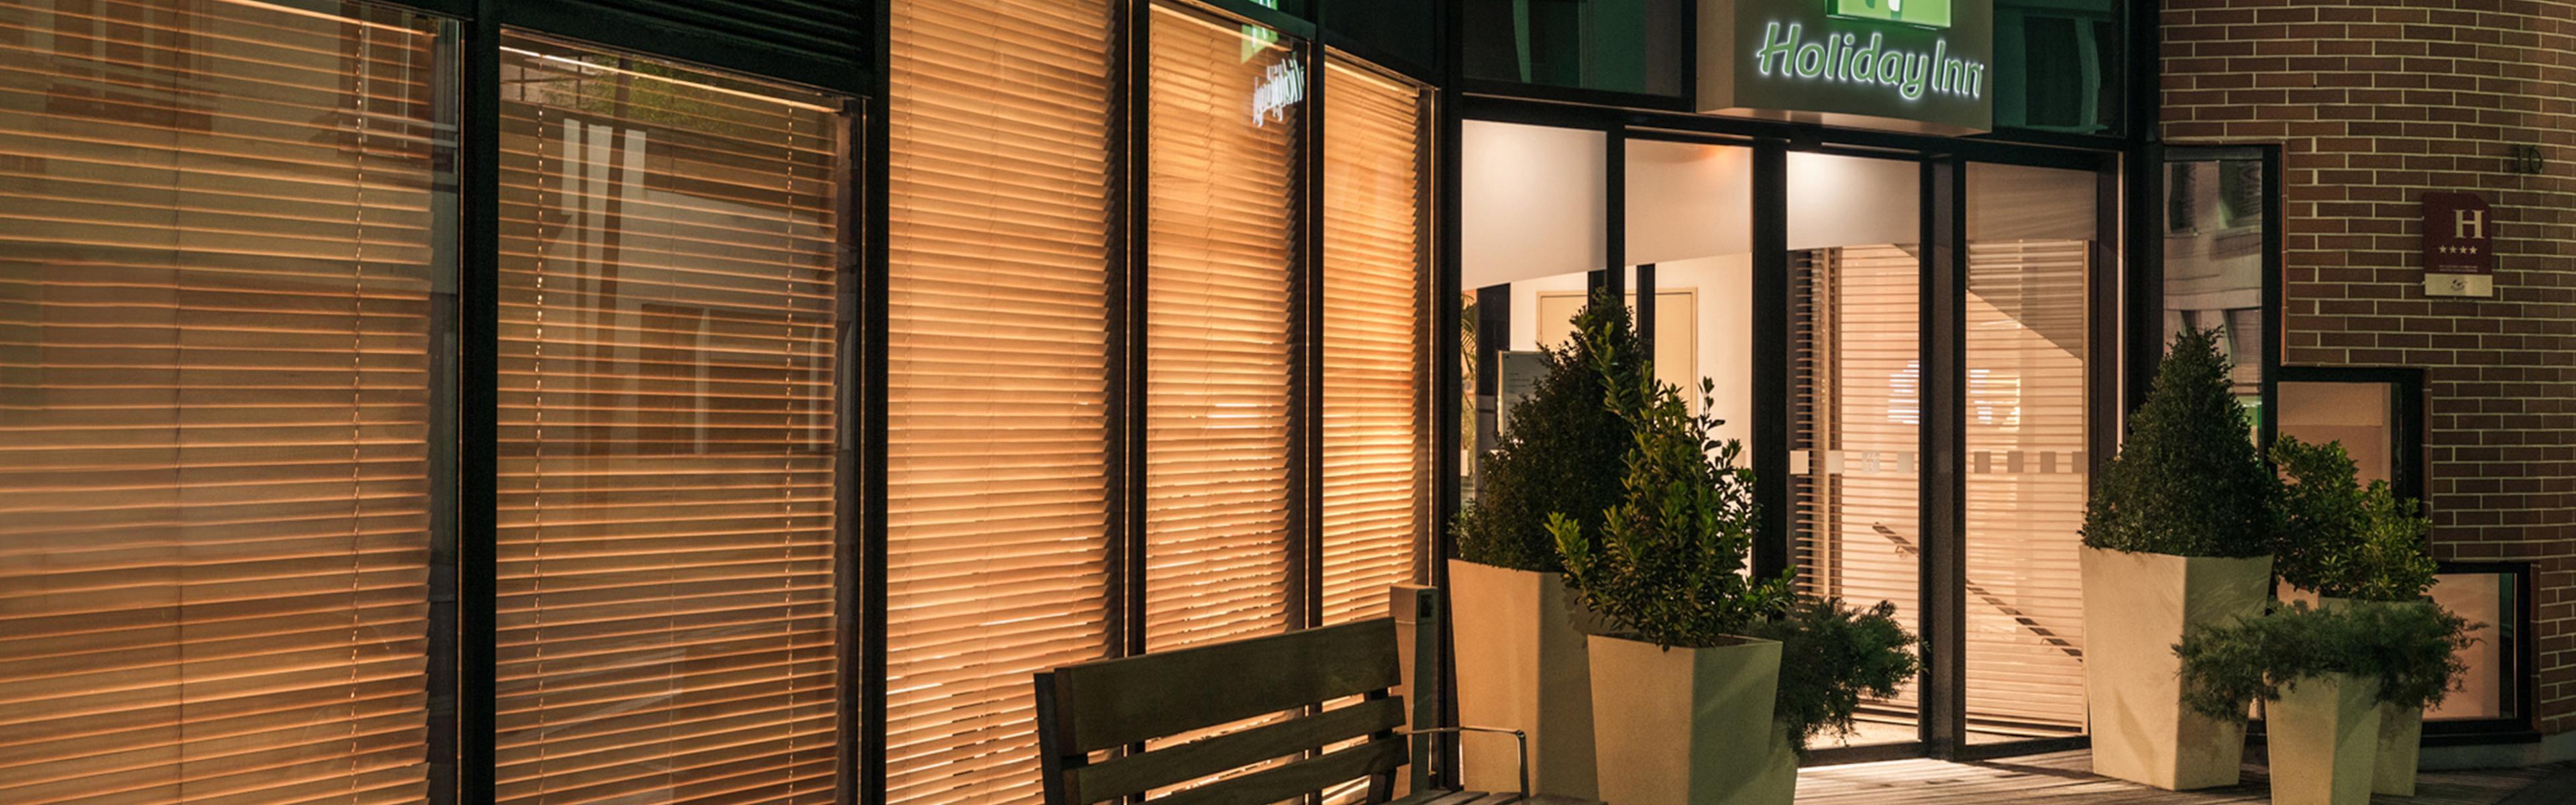 train montpellier paris pas cher with train montpellier paris pas cher ancienne lanterne sncf. Black Bedroom Furniture Sets. Home Design Ideas